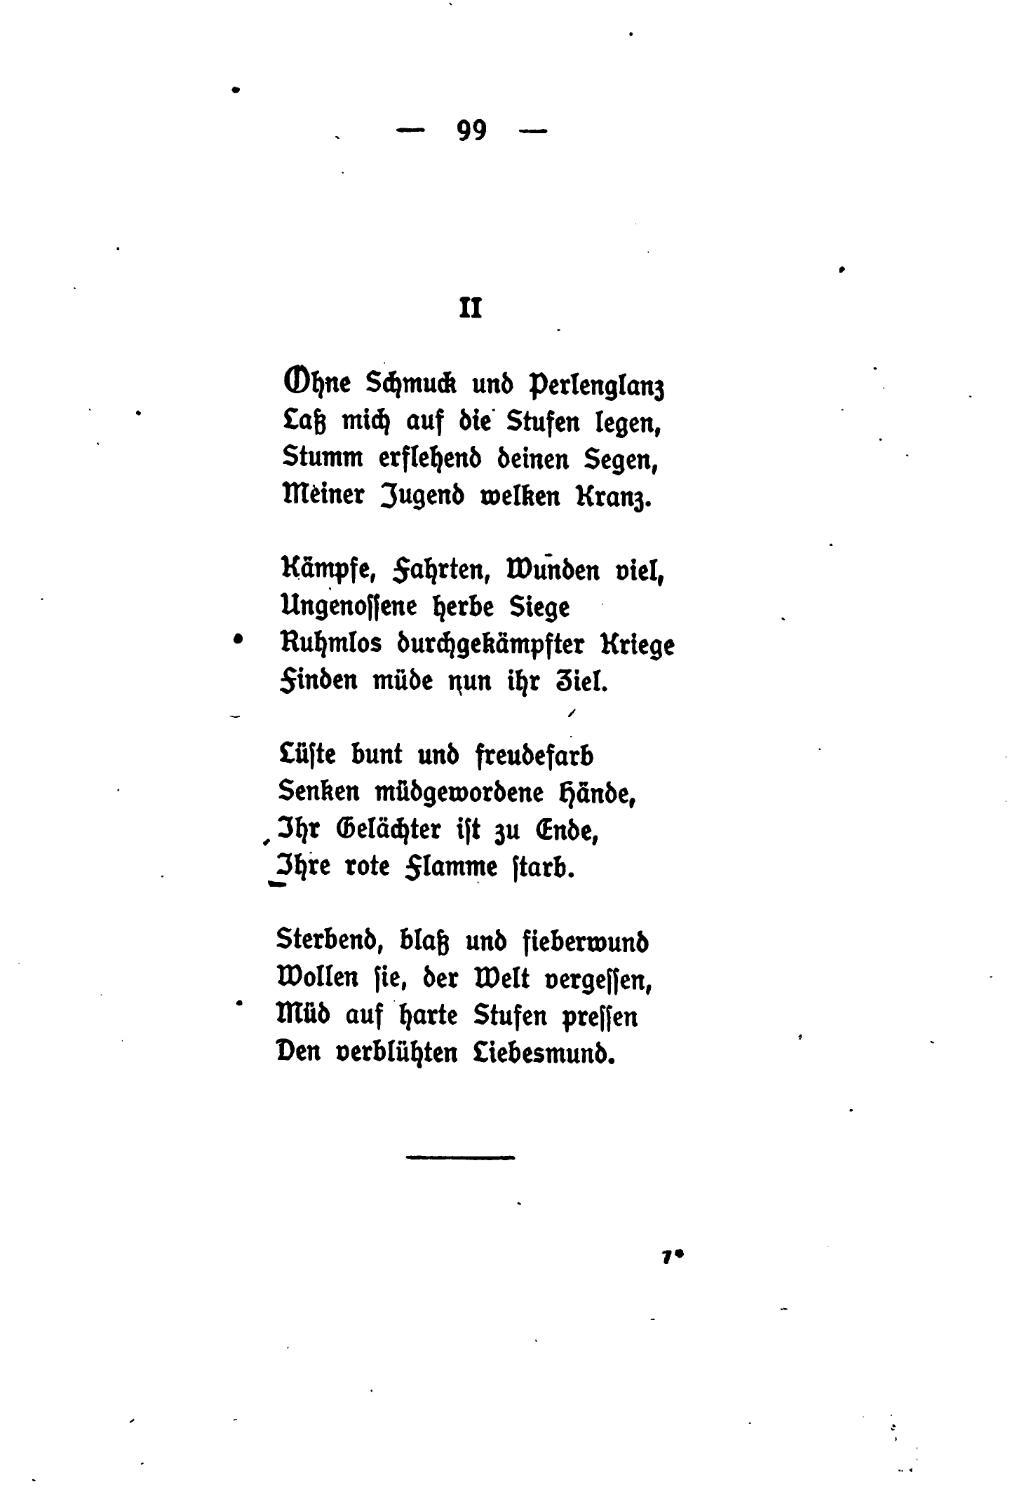 Hesse gedicht jugend